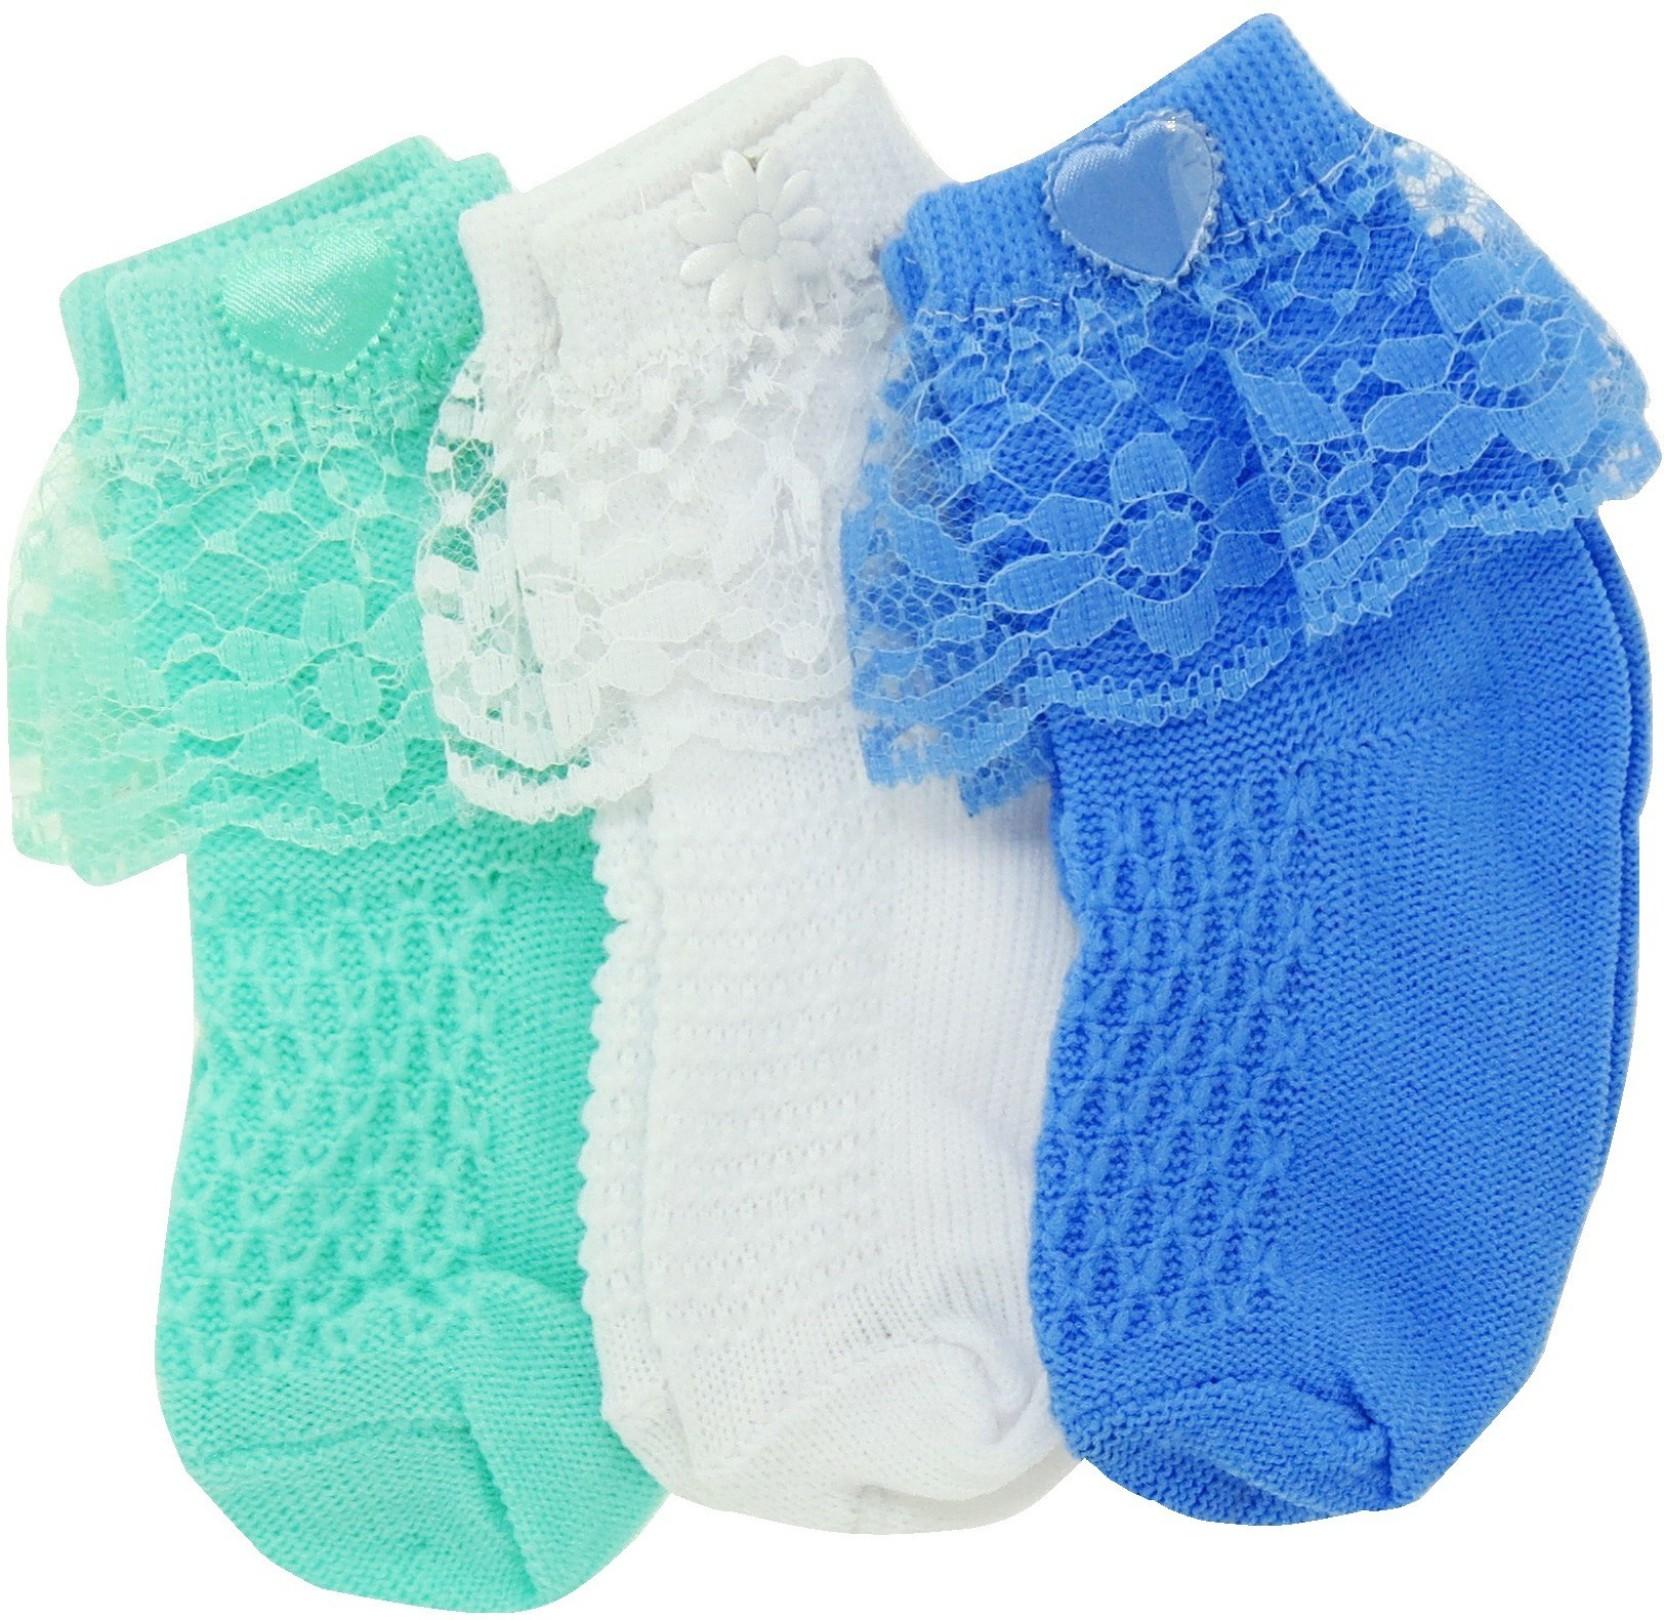 Neska Moda Baby Boys & Baby Girls Solid Ankle Length Socks Buy